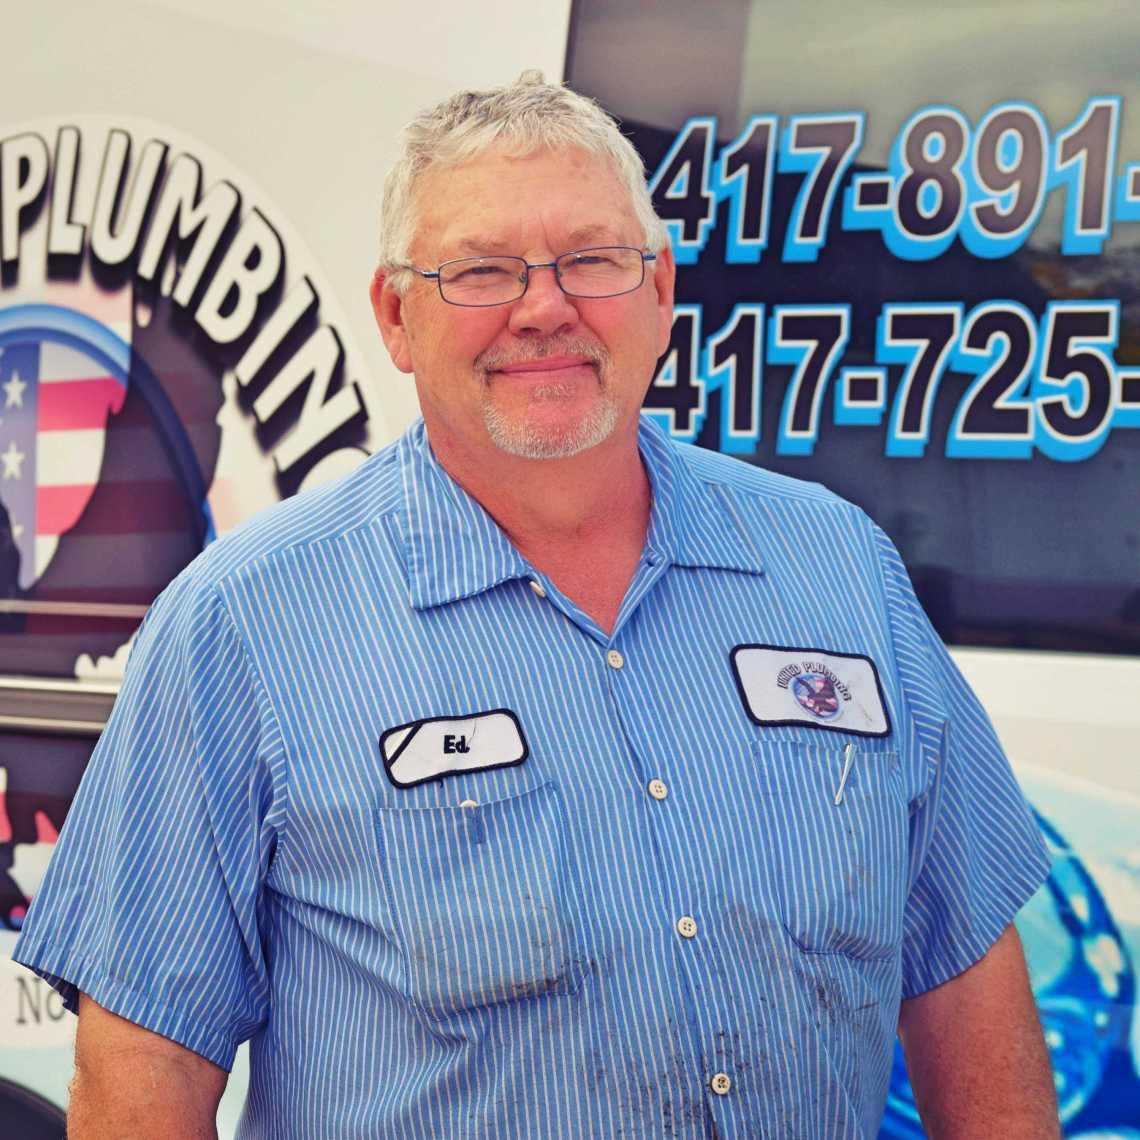 Ed Culbertson - Owner Square Headshot - United Plumbing Springfield MO